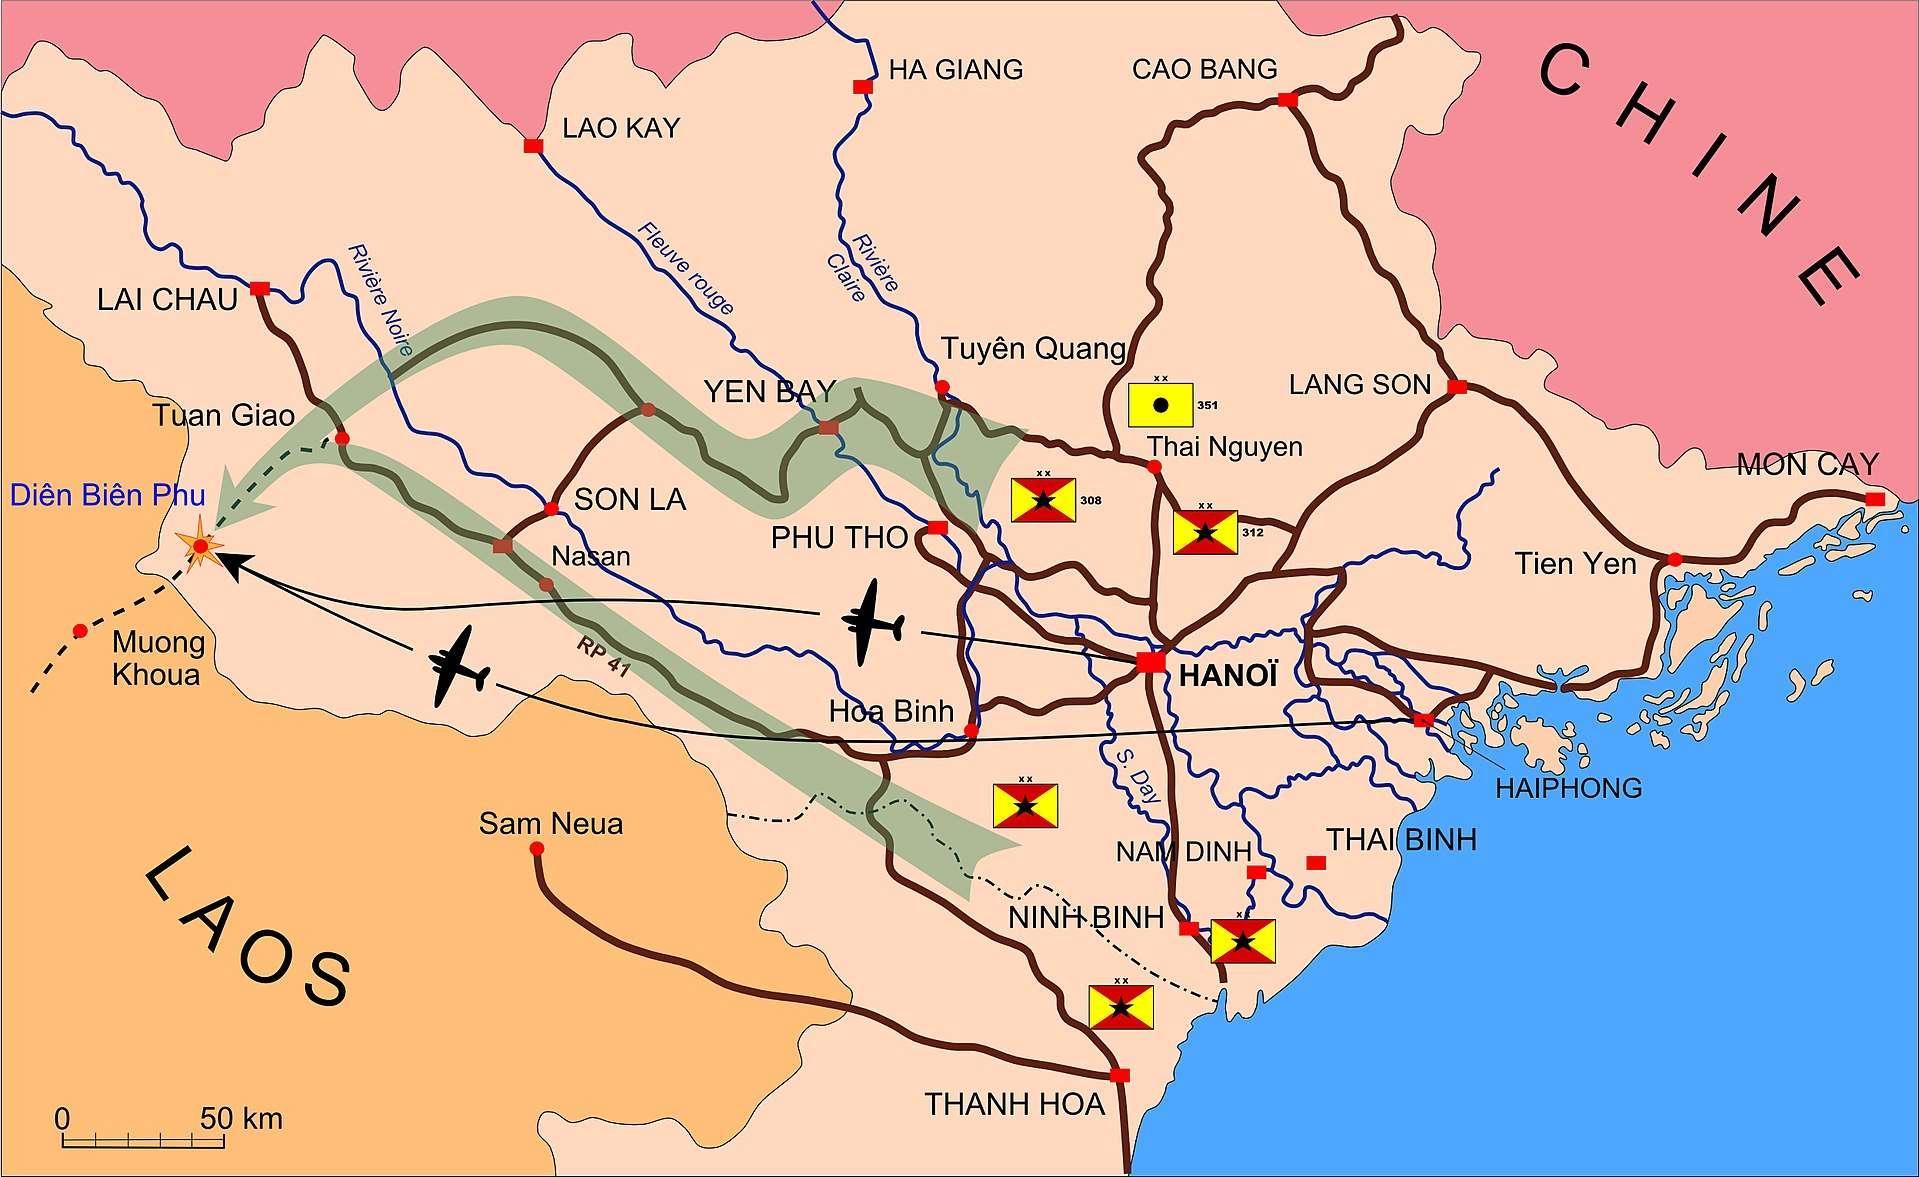 Plan de situation de la bataille de Dien Bien Phu 20-Νοε-1953 ως 7-Μαΐ-1954